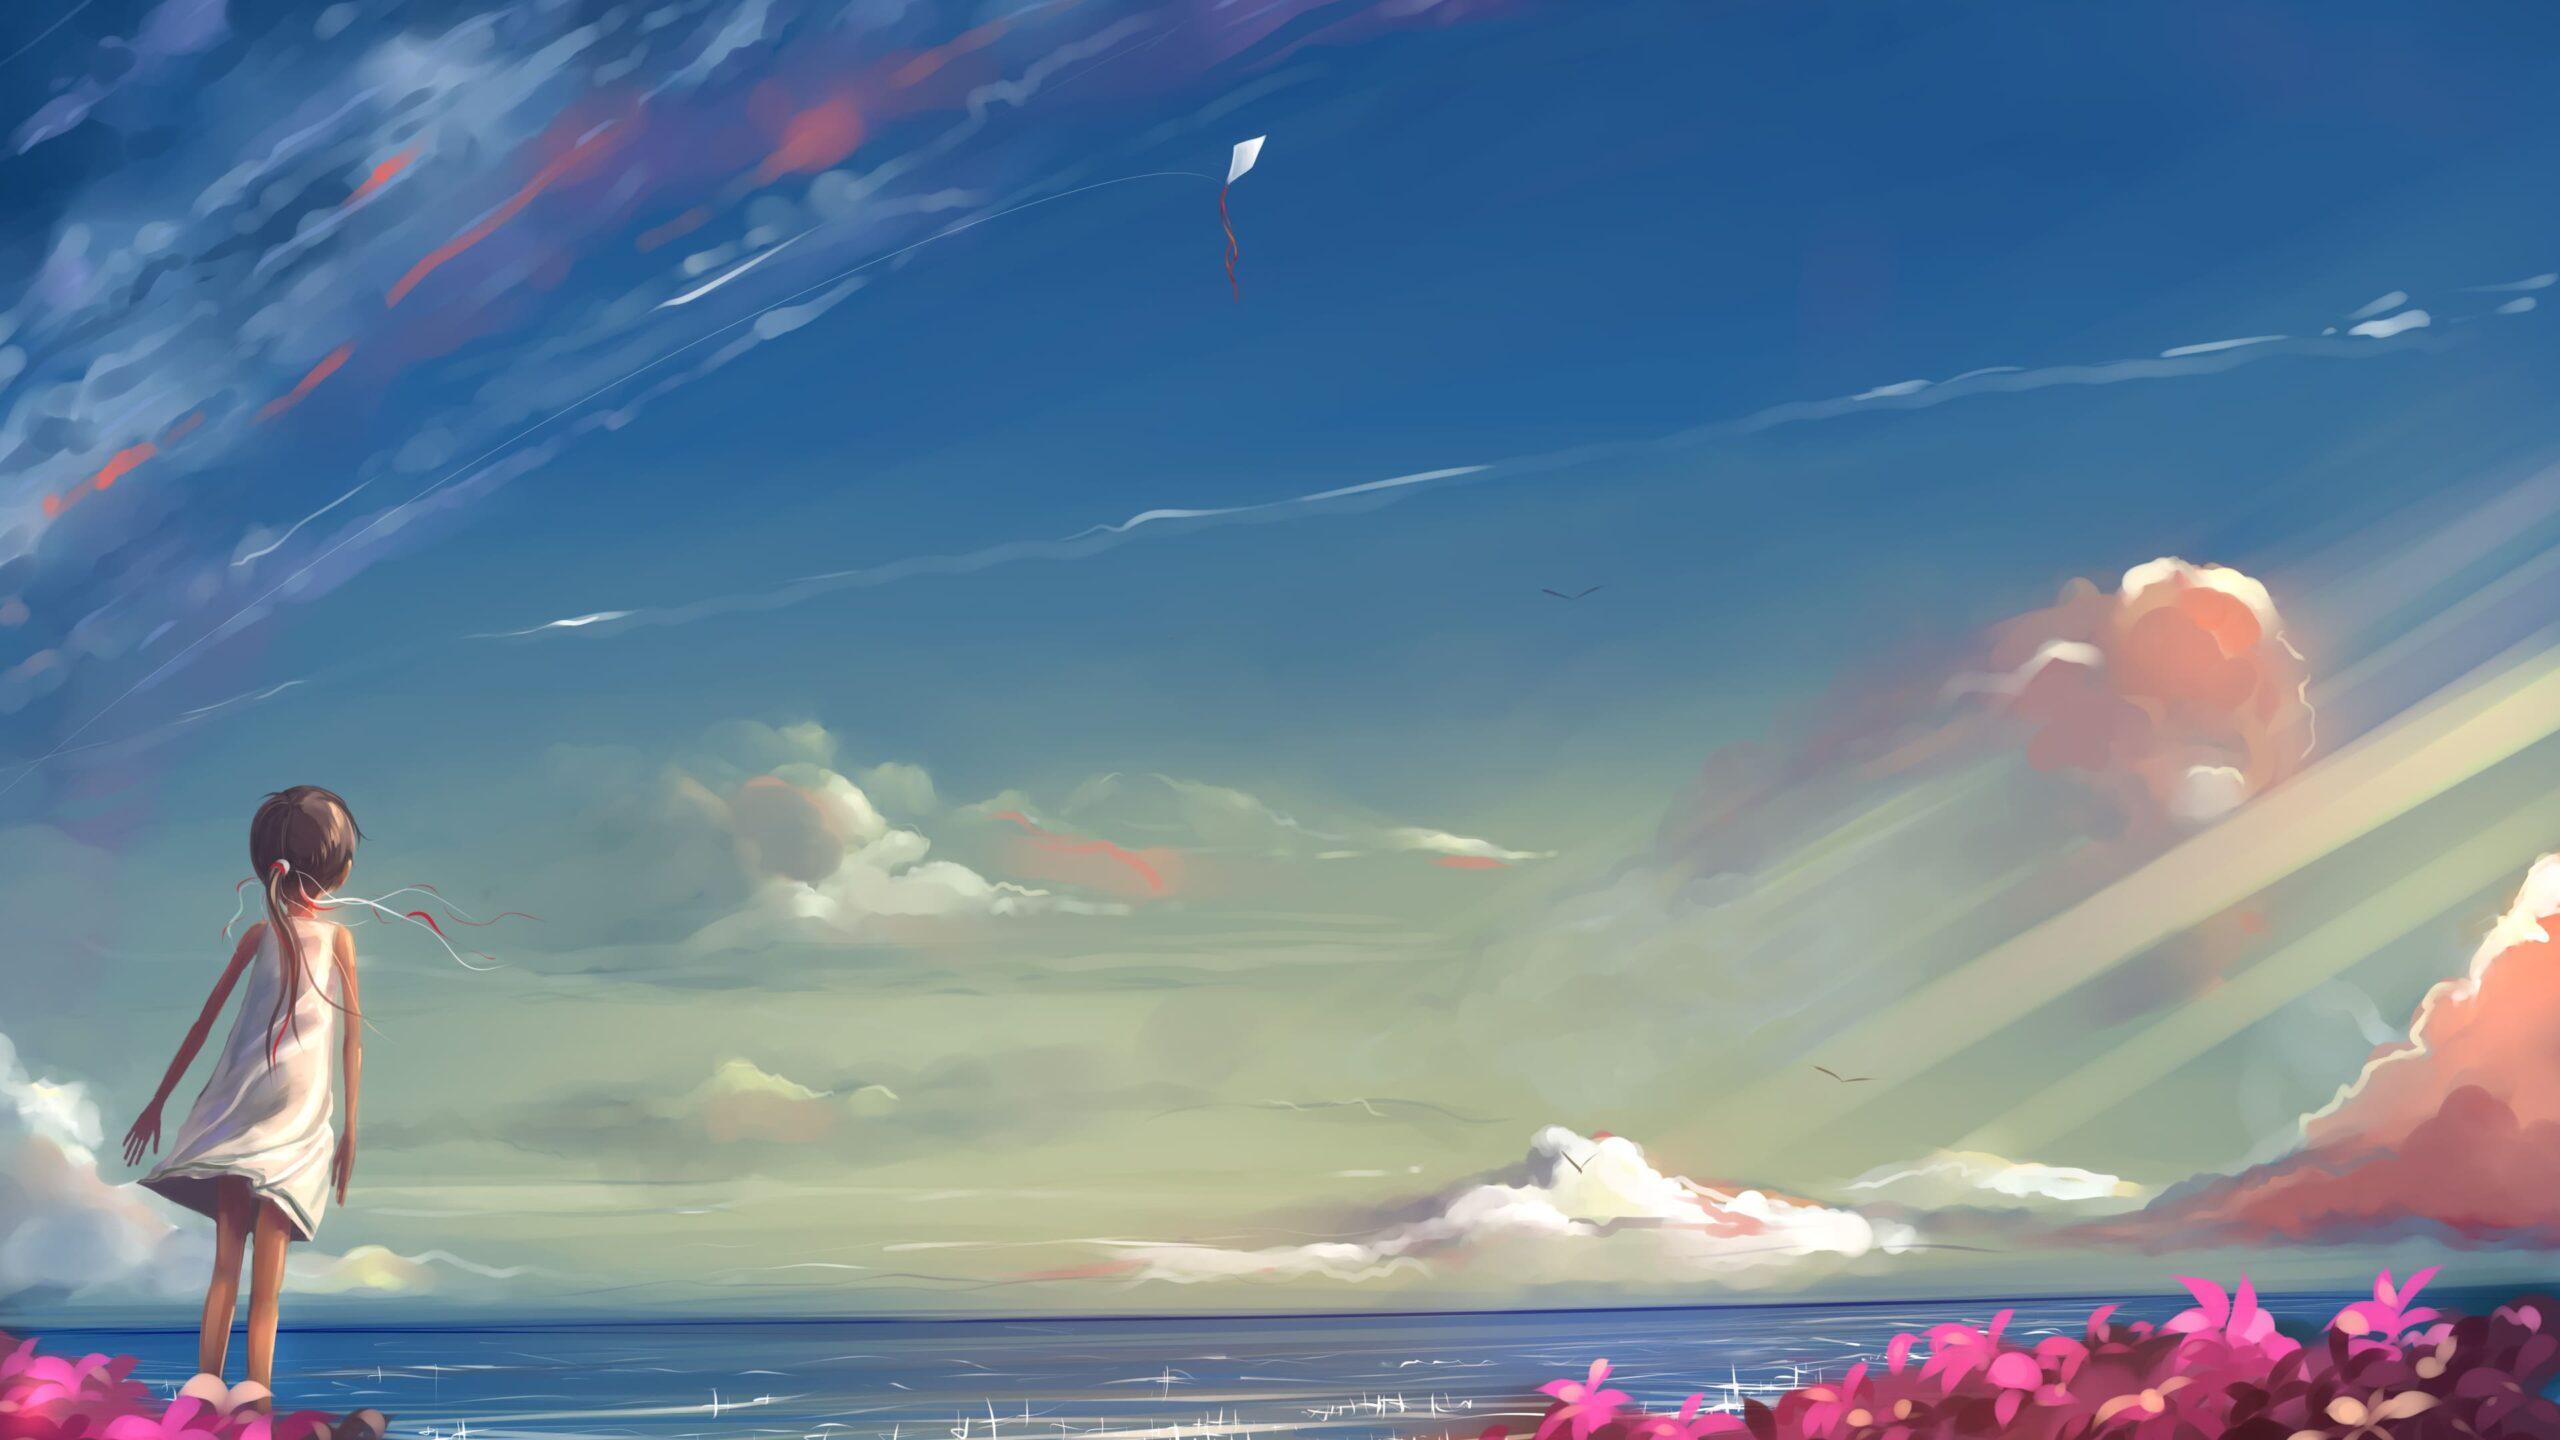 Anime Desktop Wallpaper 4k Top Best Anime Desktop 4k Wallpaper Download